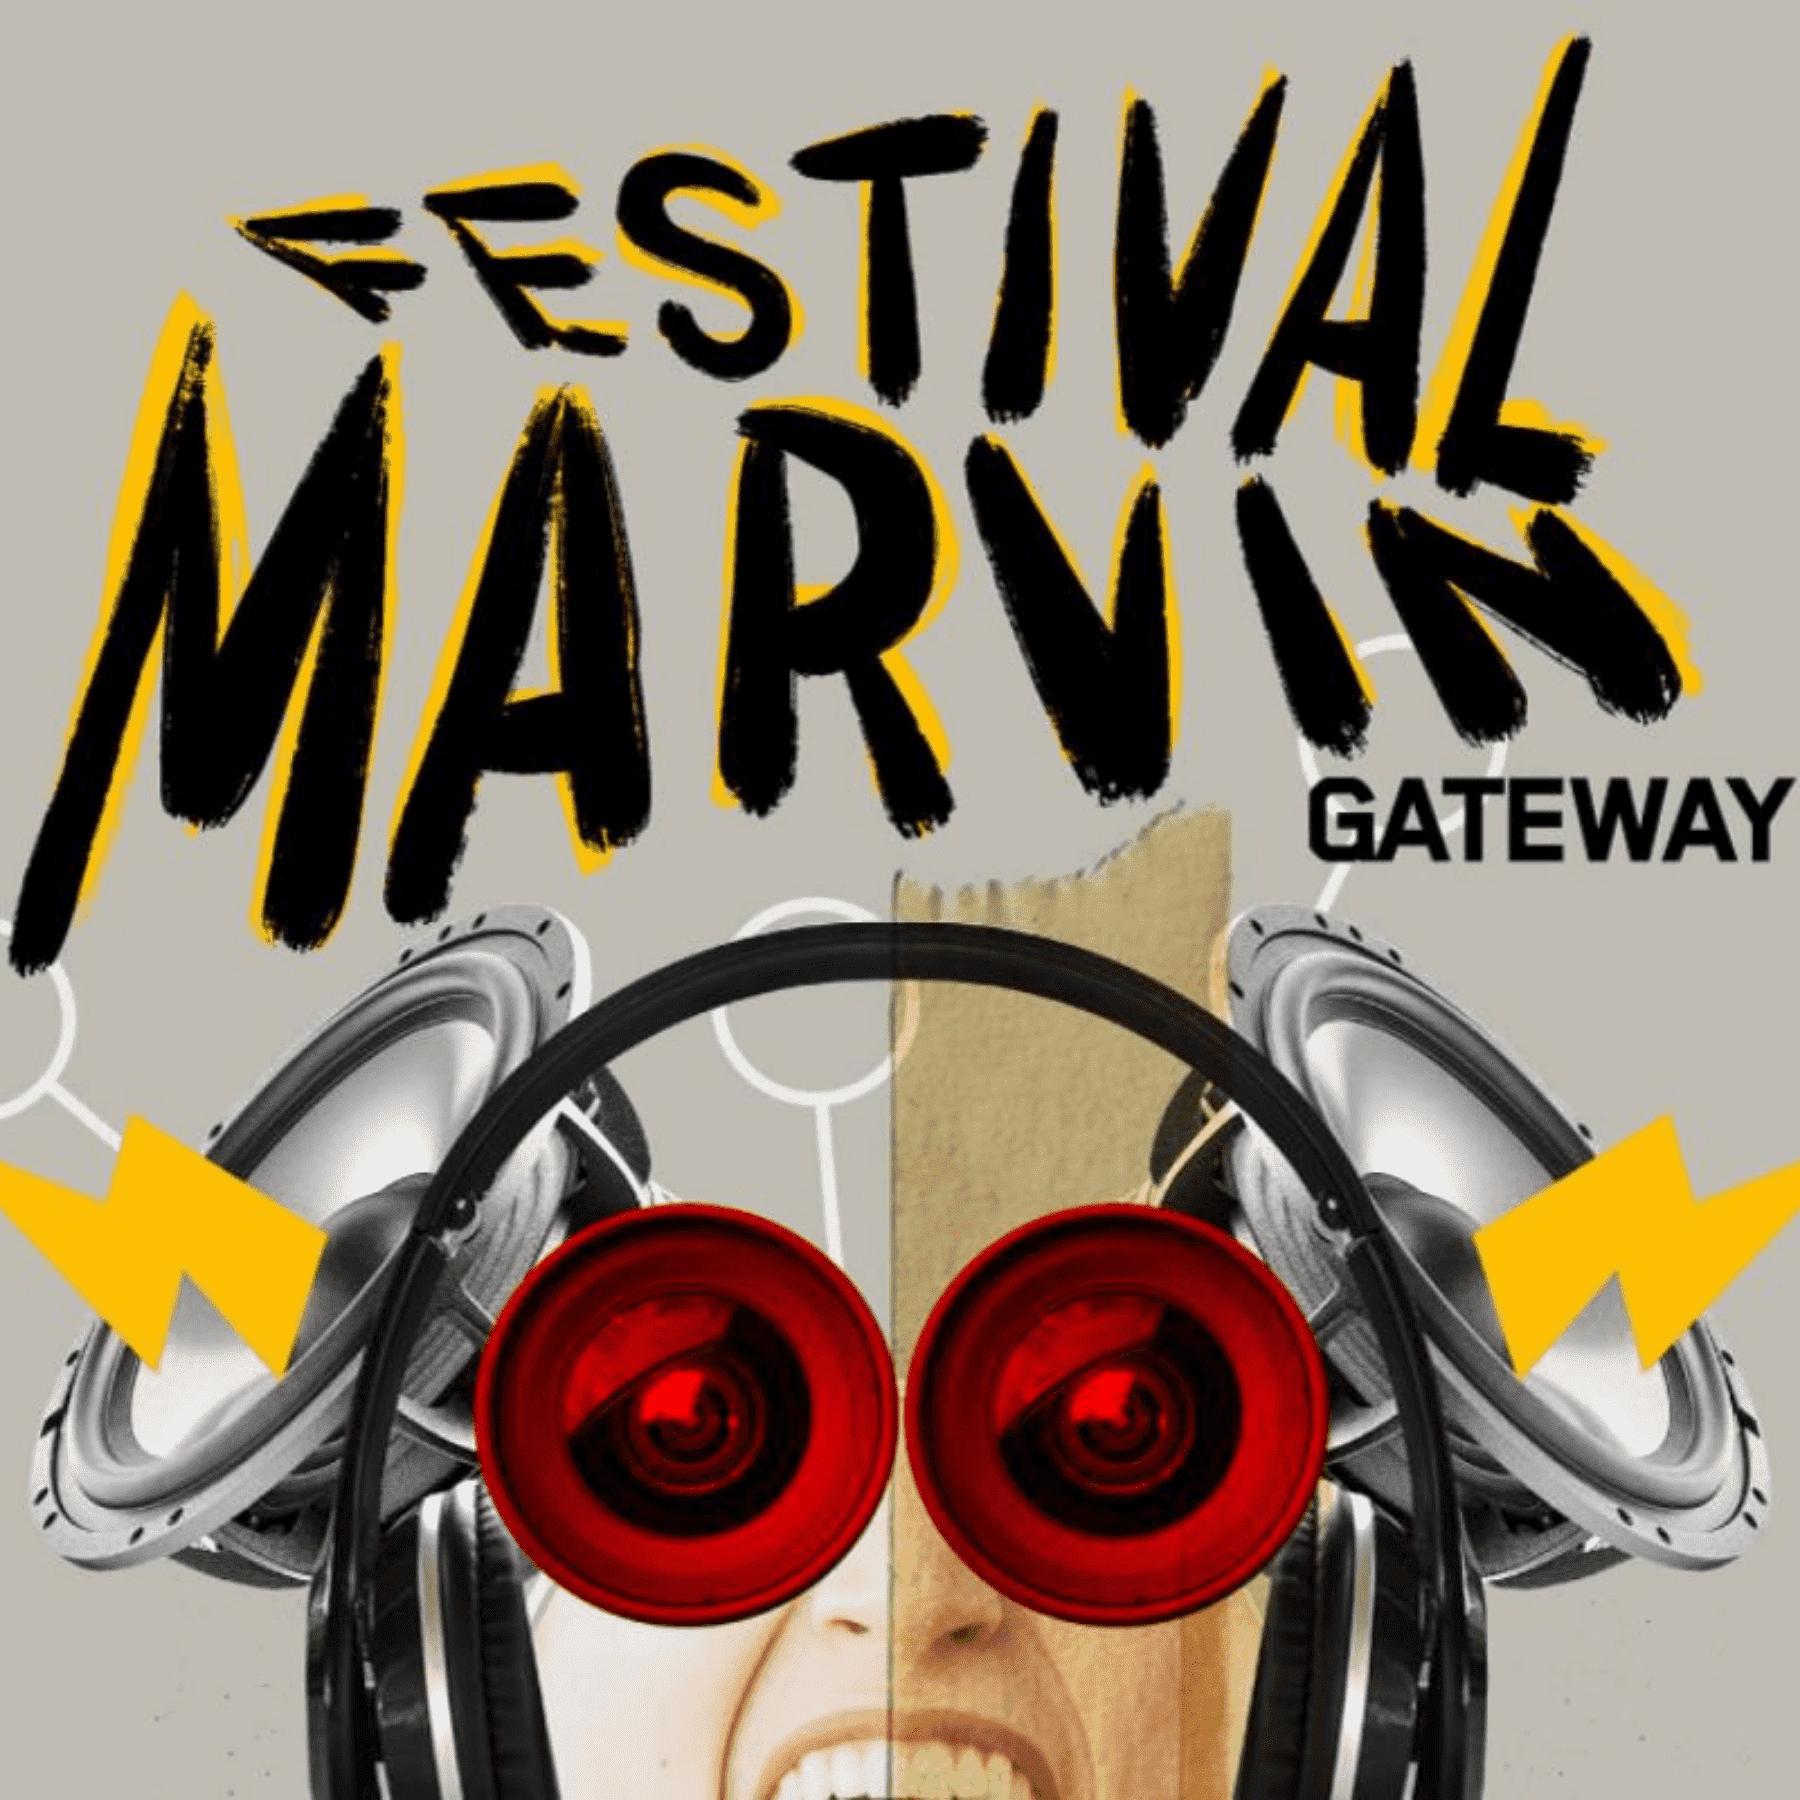 _Festival Marvin Gateway